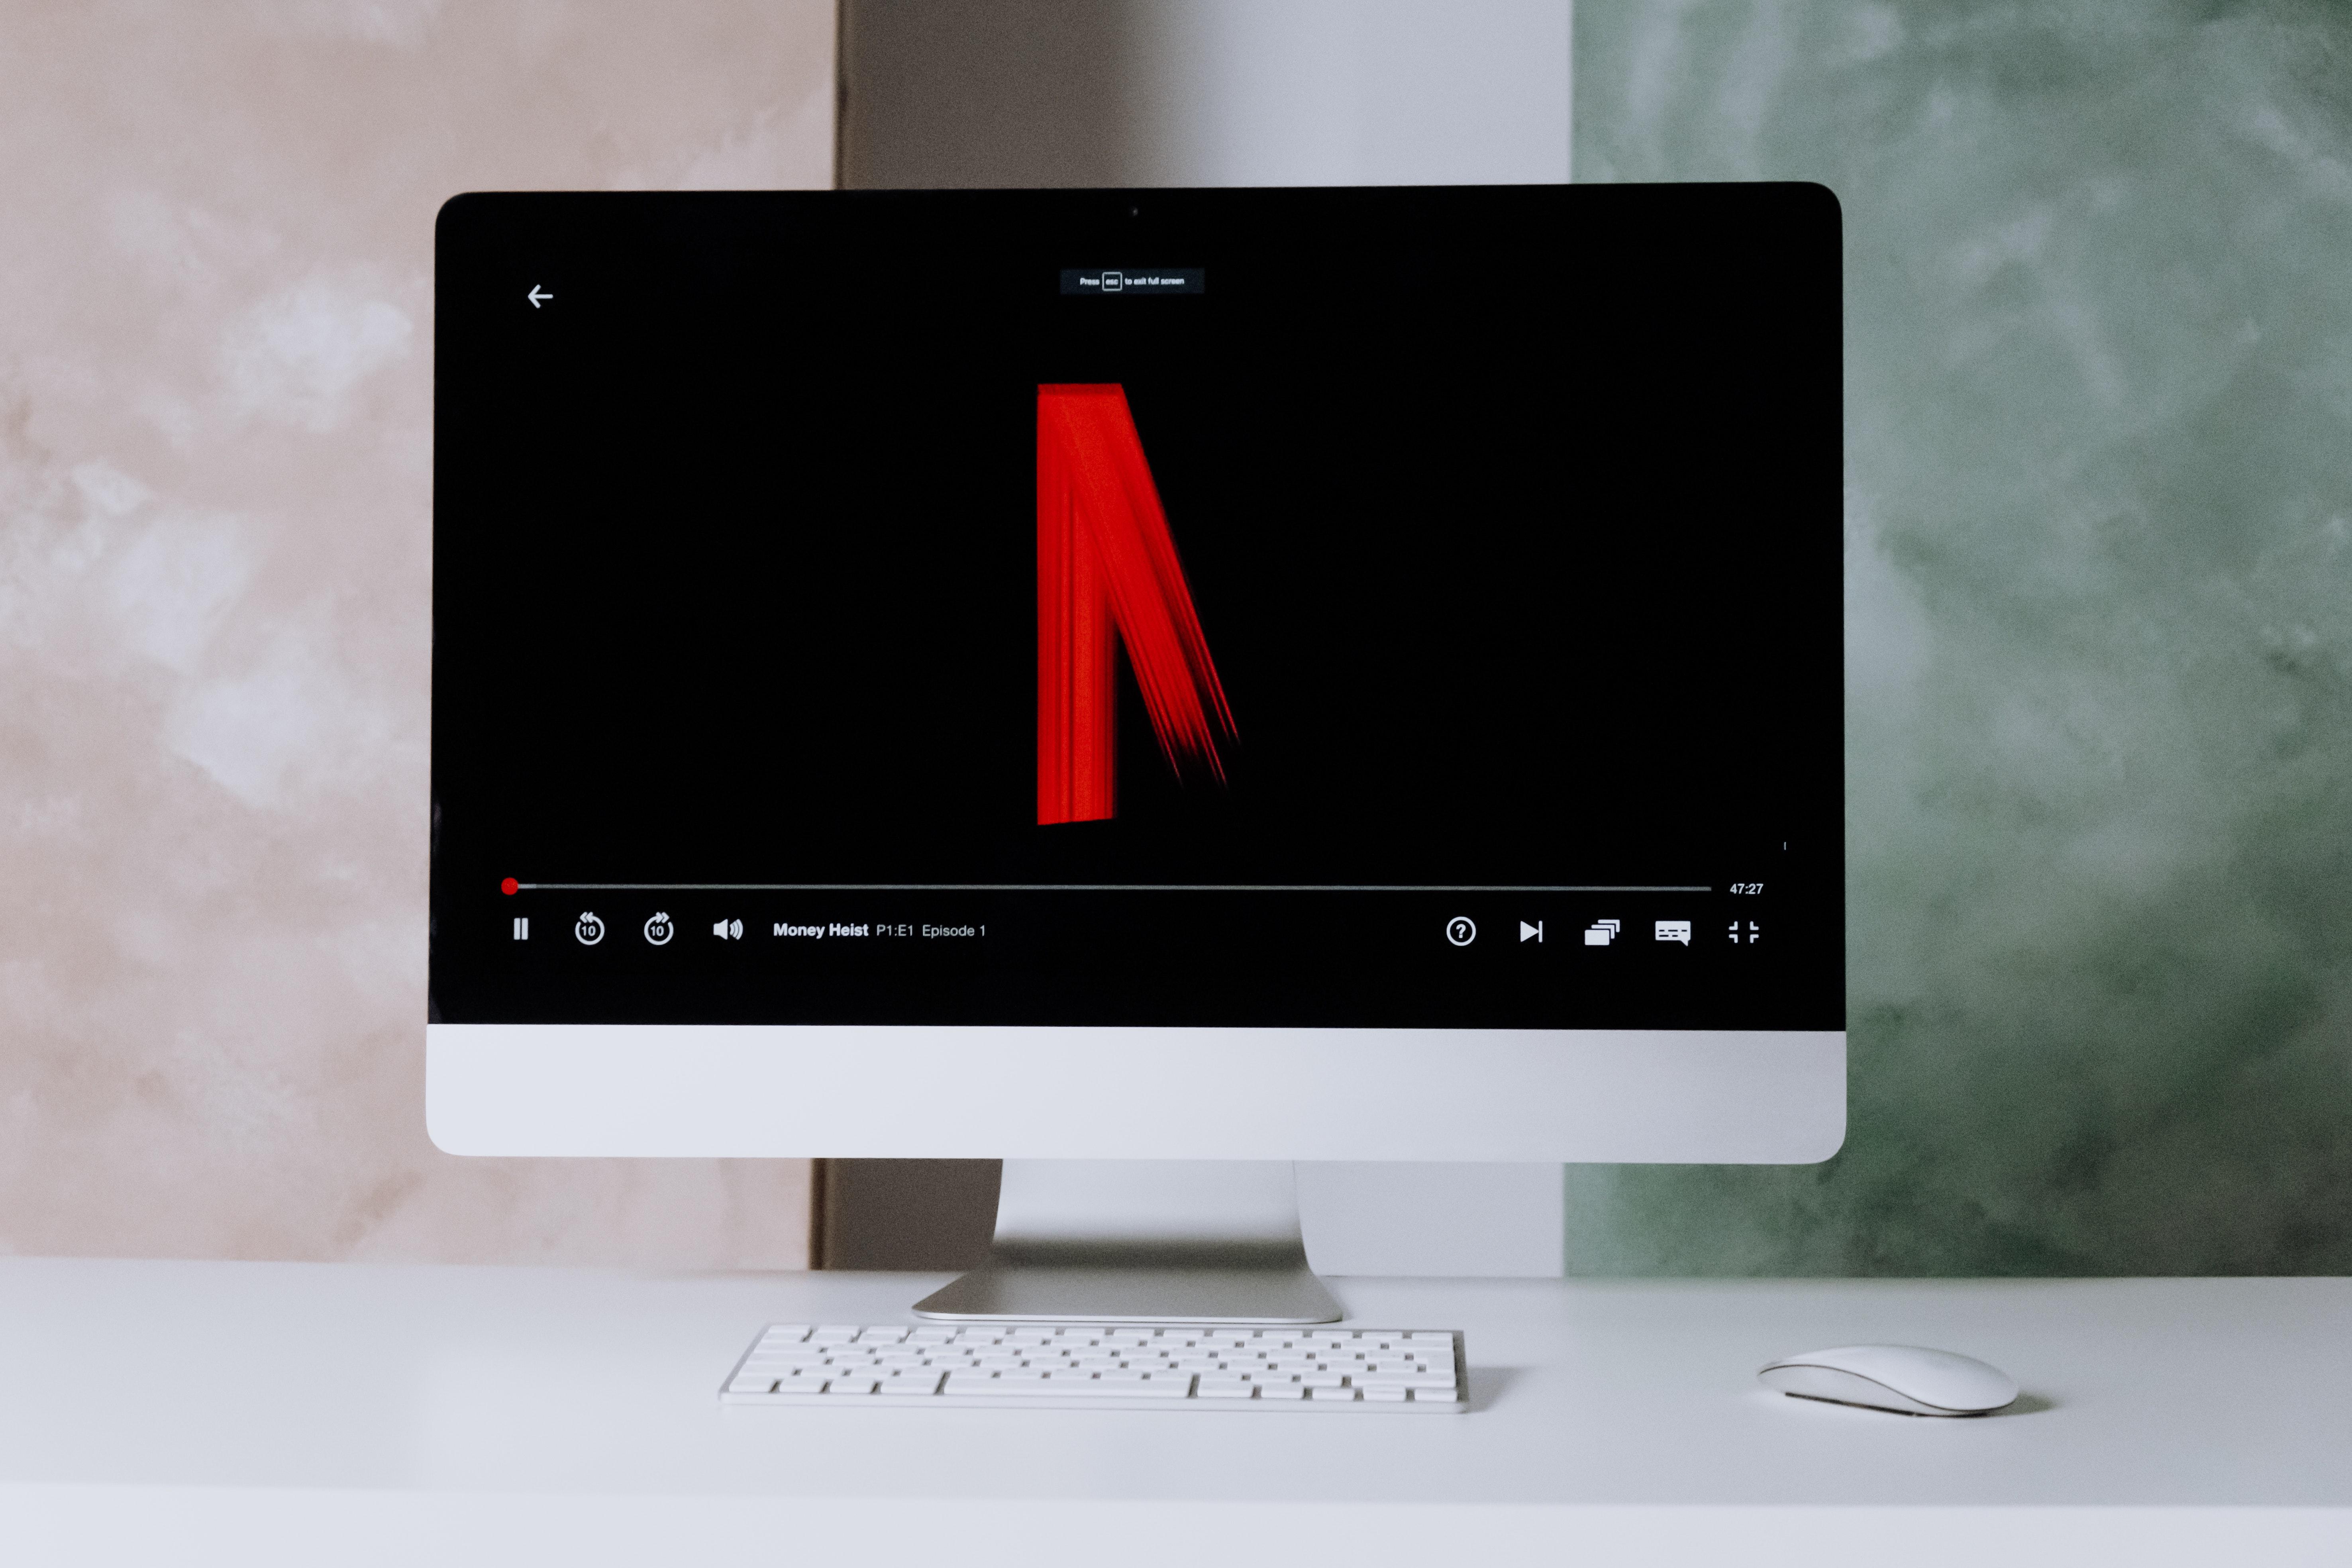 Streaming, Streaming-Markt, deutsche Streaming-Dienste, Netflix, Amazon Video, Joyn, Sky, TV Now